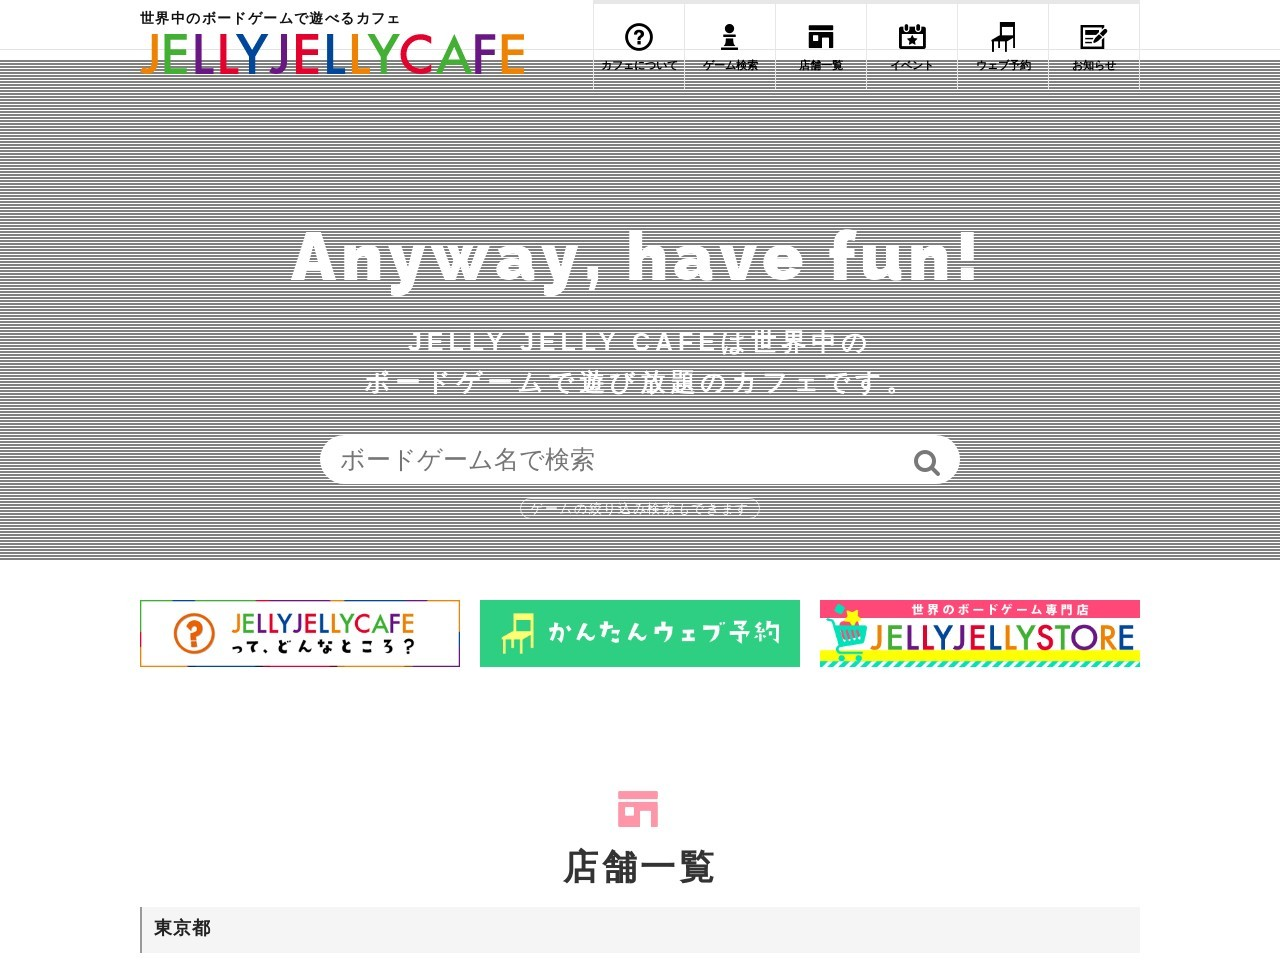 http://jellyjellycafe.com/access